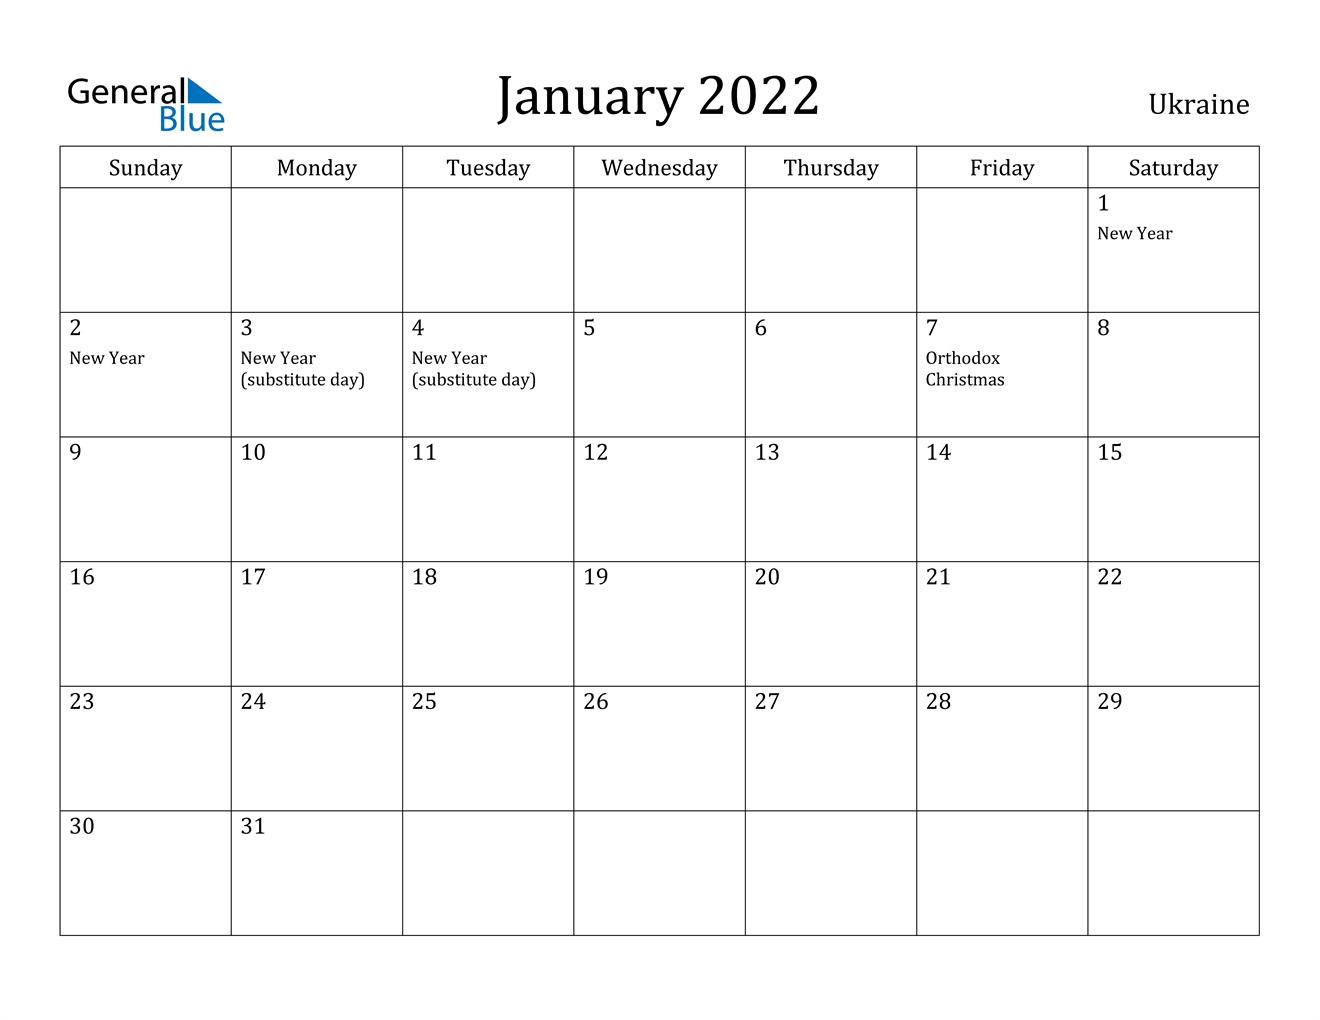 January 2022 Calendar - Ukraine Throughout January2022 Printable Calendar Cute